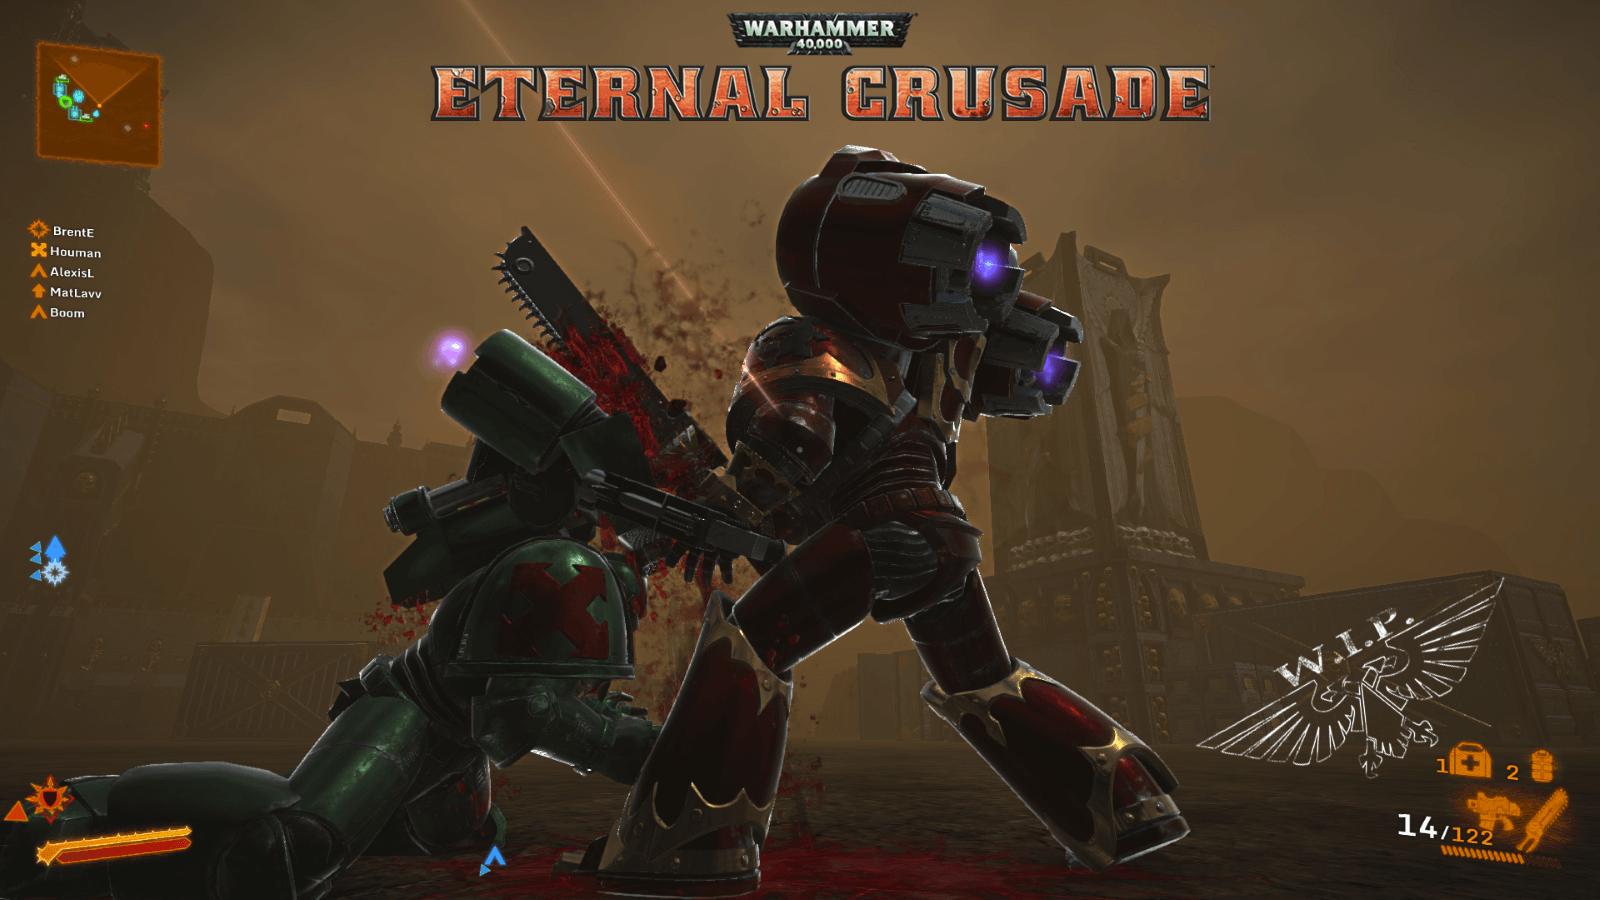 Warhammer 40,000 Eternal Crusade Entering Closed Alpha Testing news header